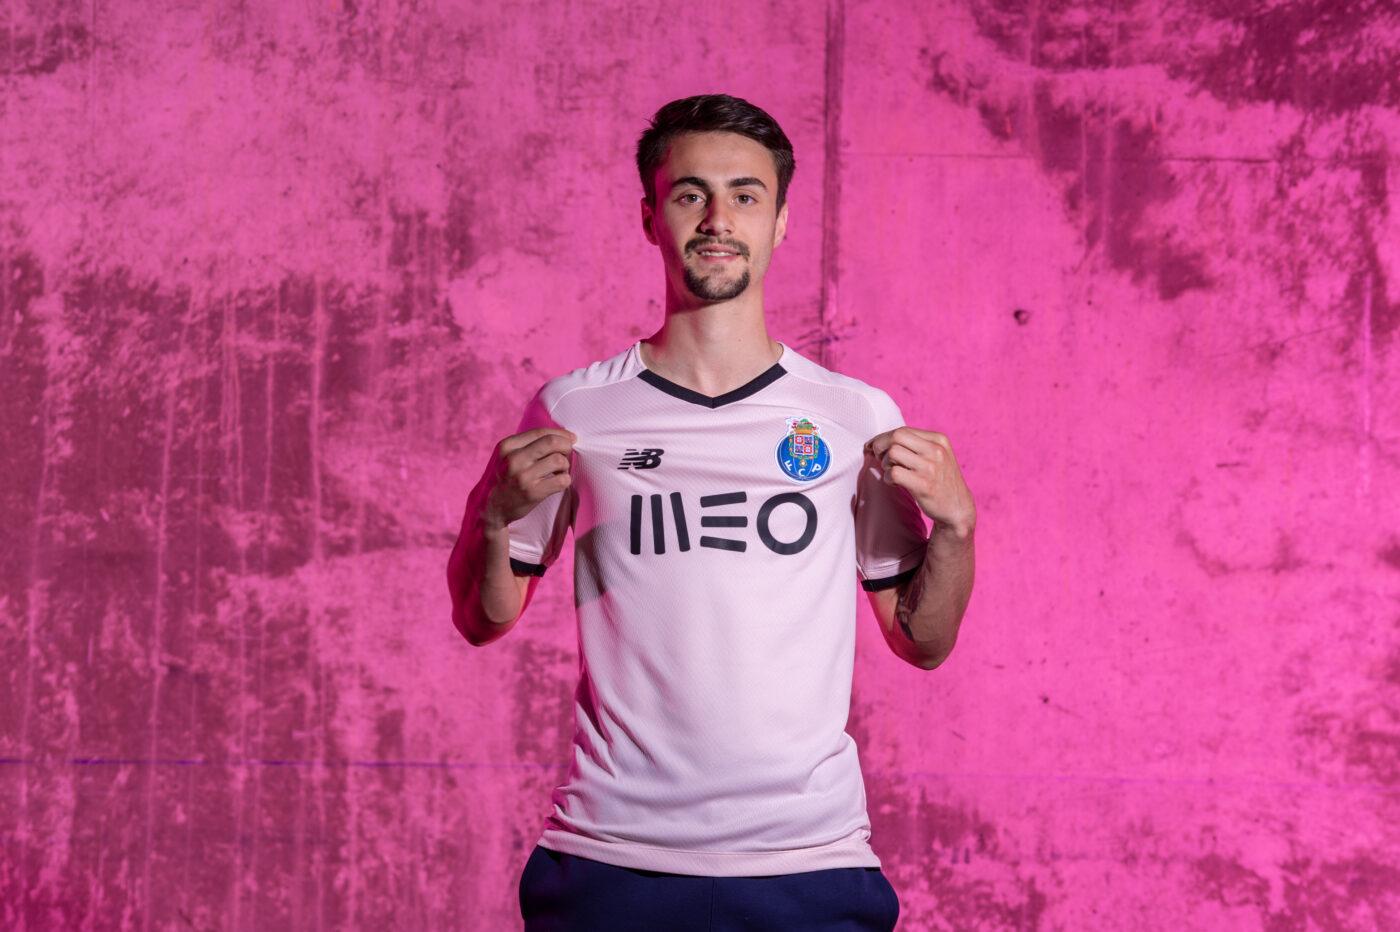 Maillot FC Porto 2021-2022 third